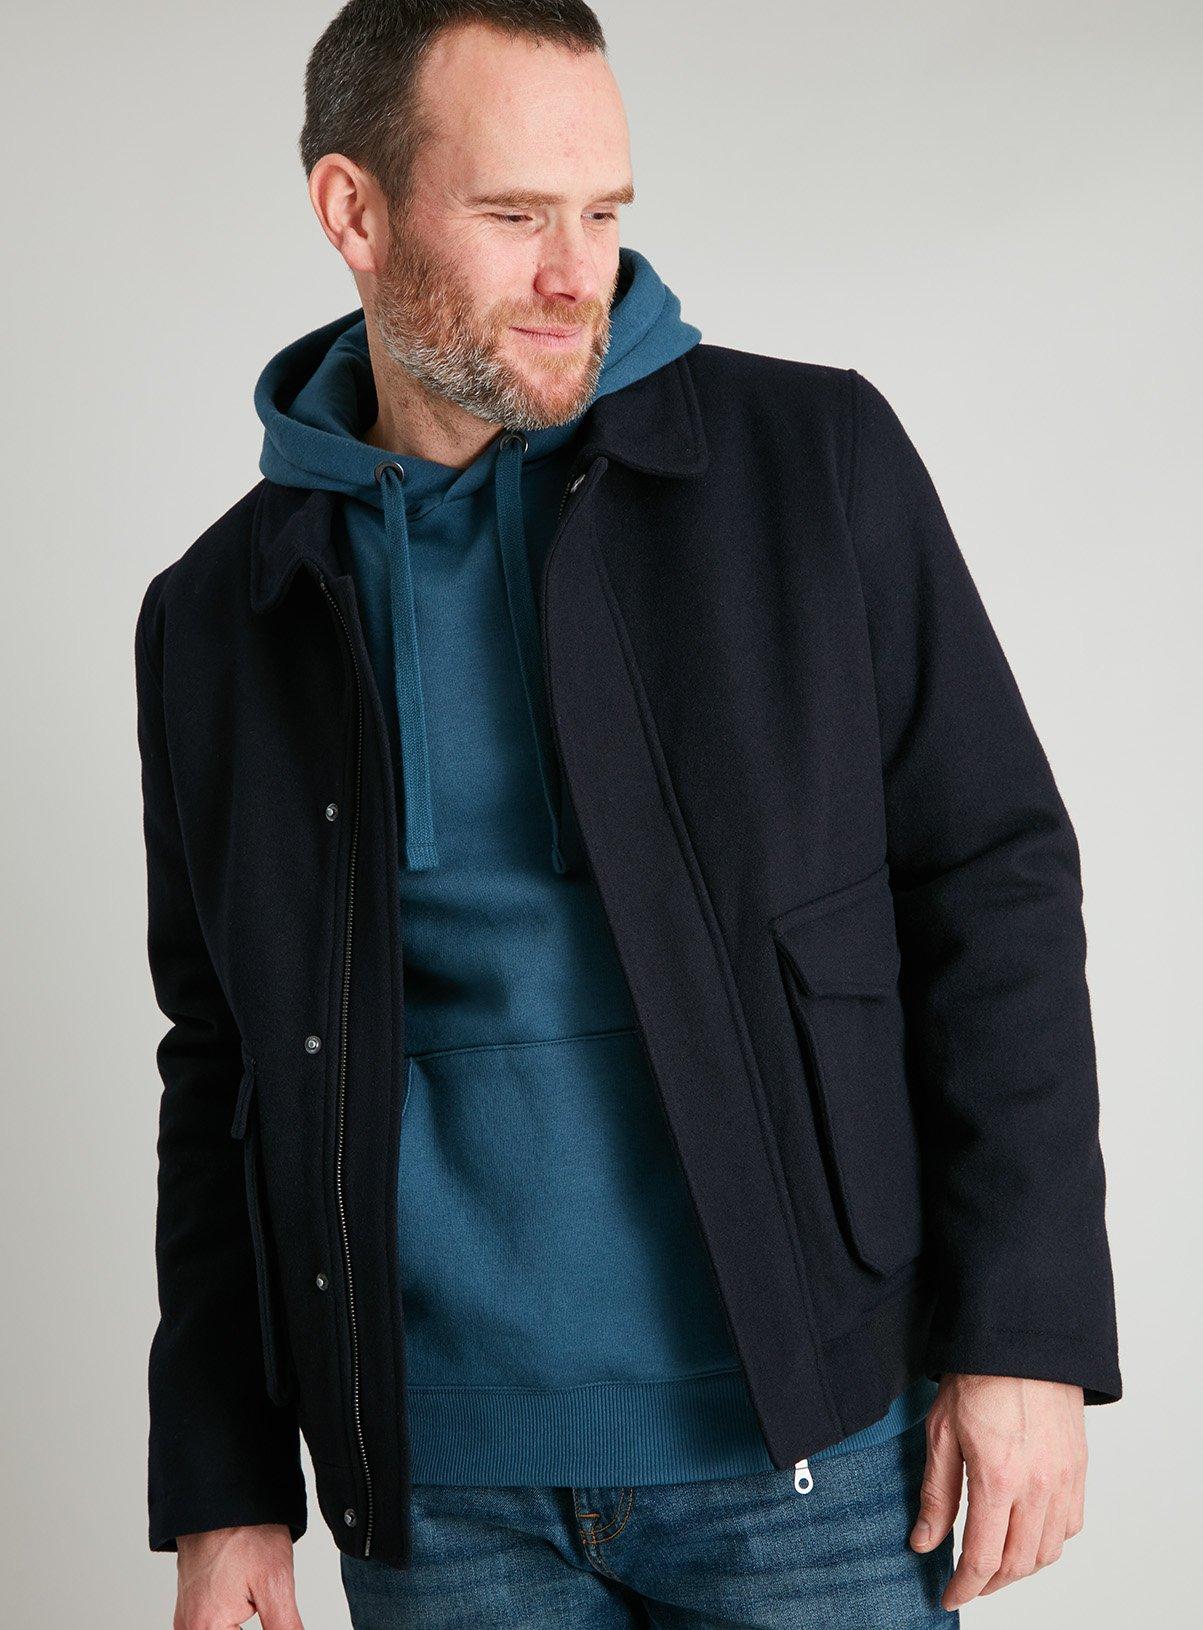 Tu Clothing Premium Navy Wool Rich Blouson Jacket for £22.50 click & collect @ Sainsbury's Tu Clothing